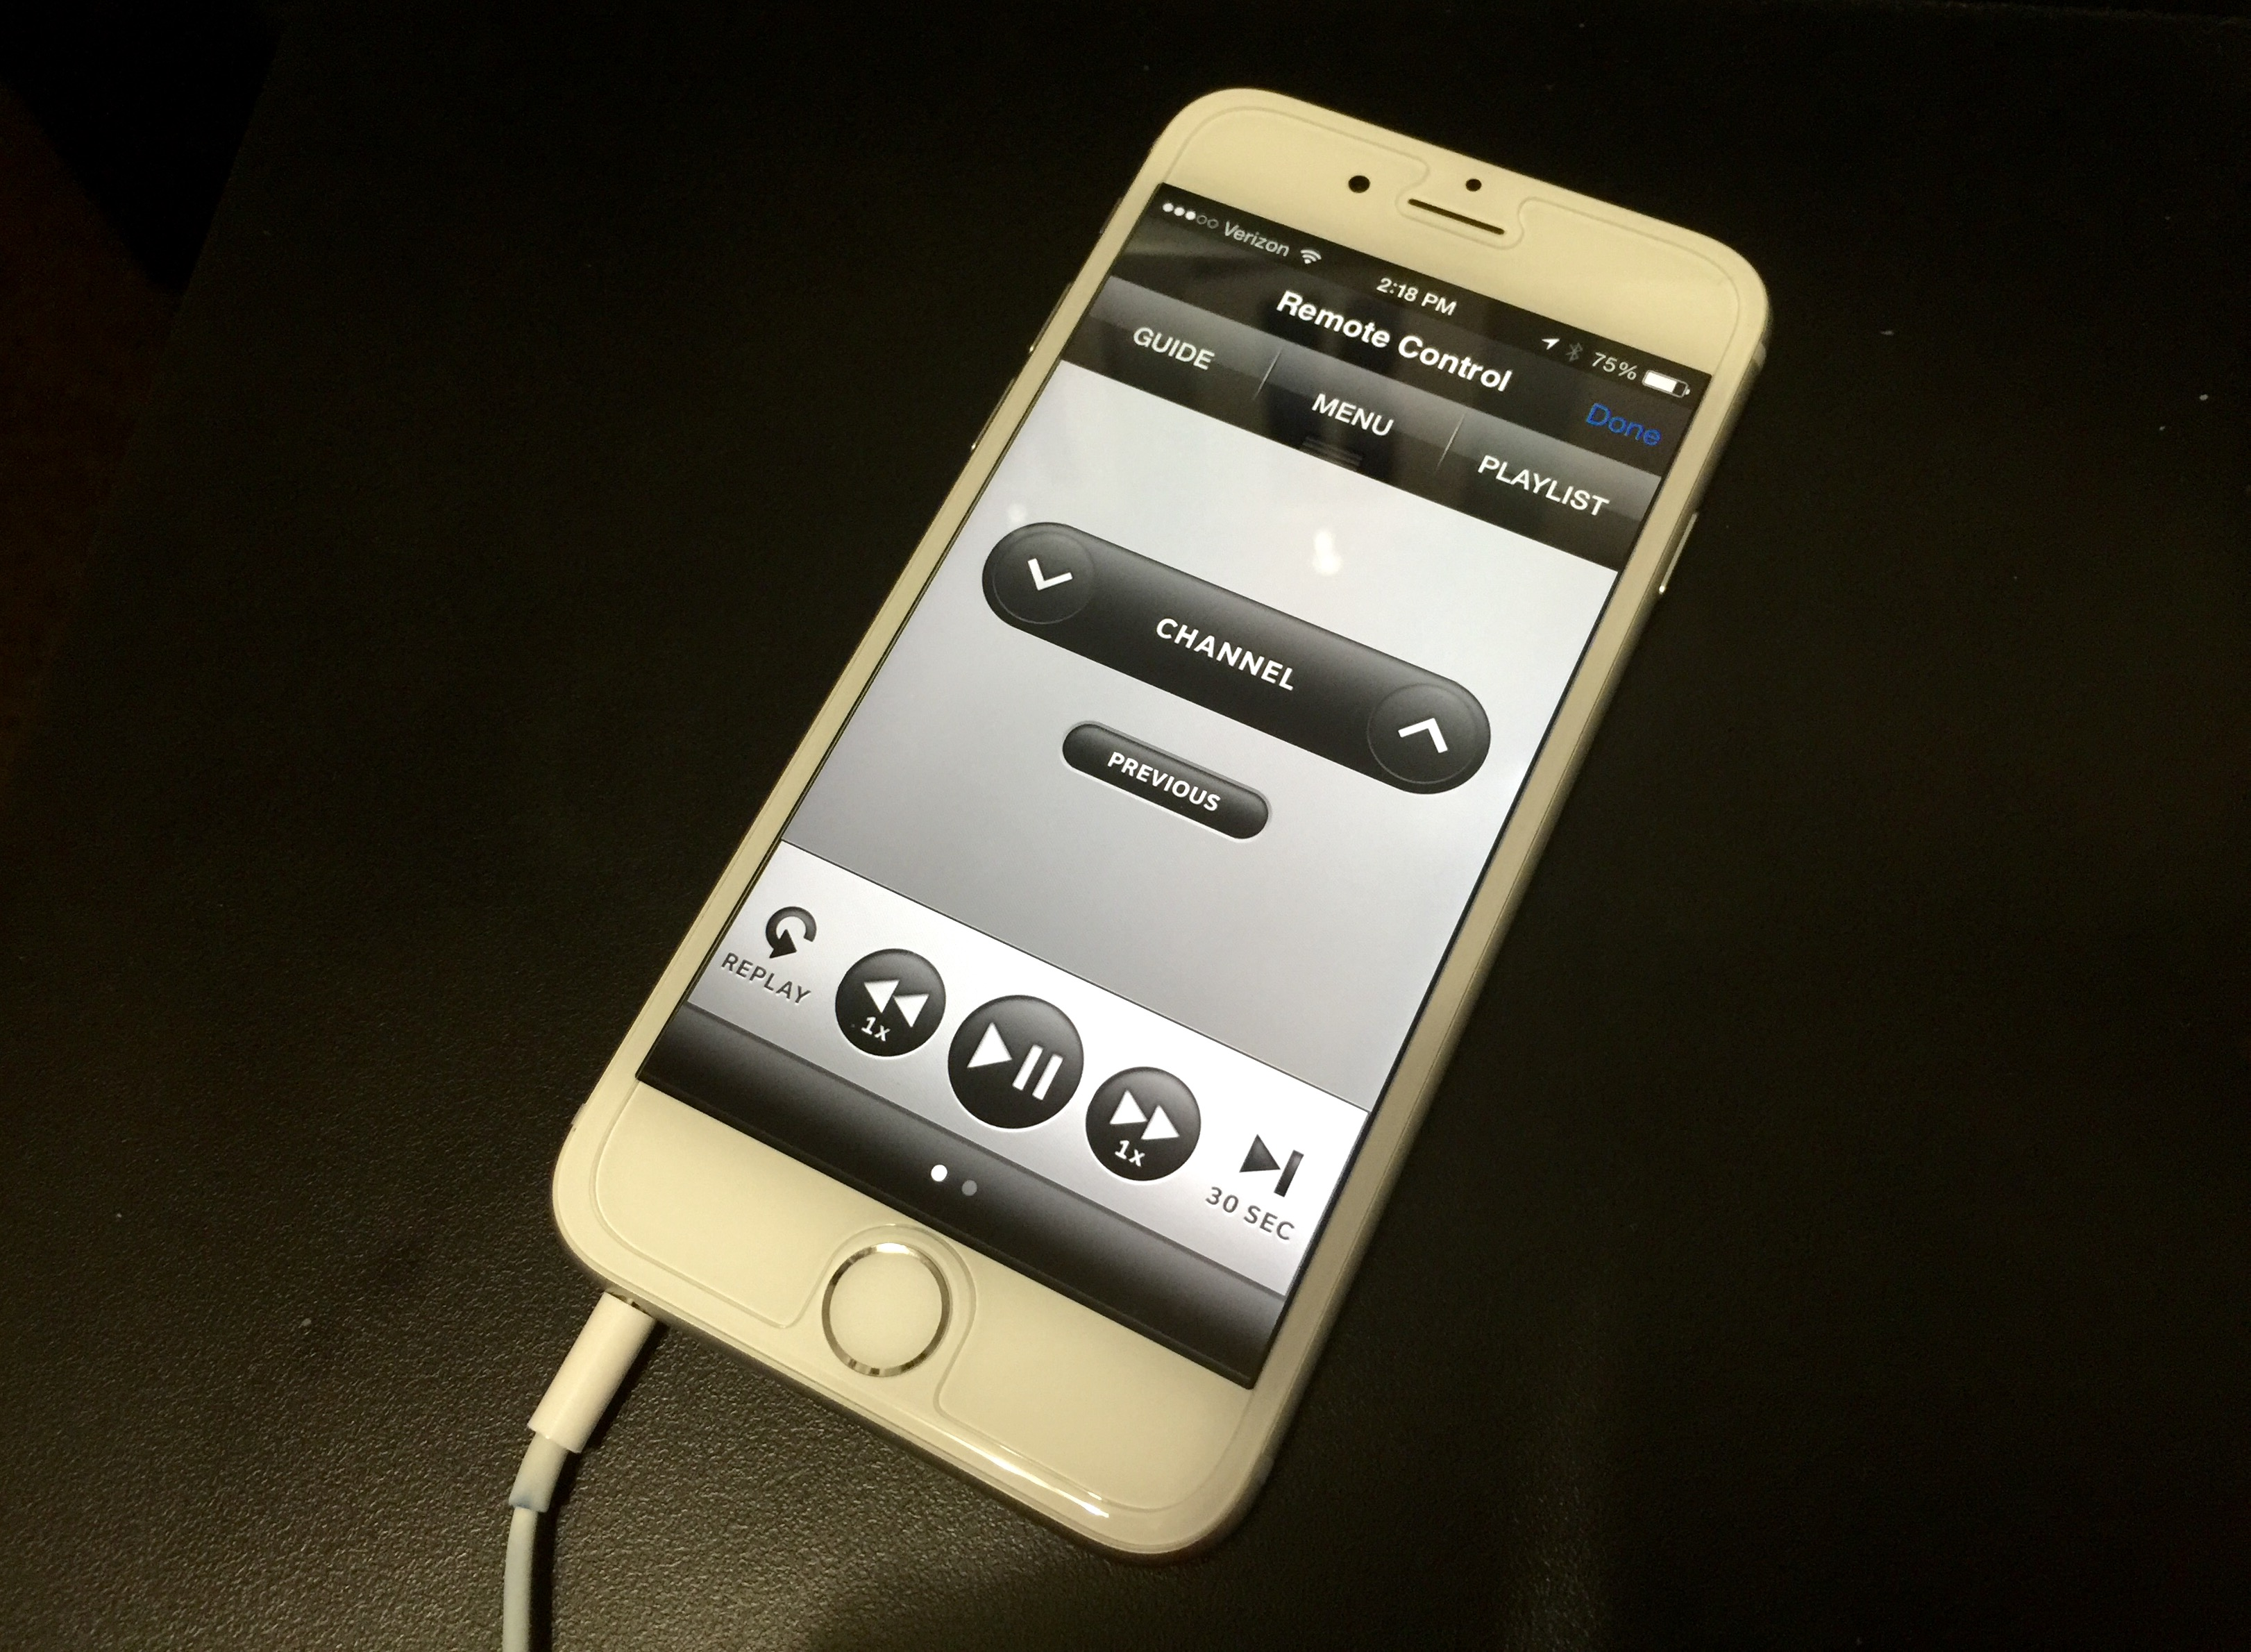 iphone rf remote control app